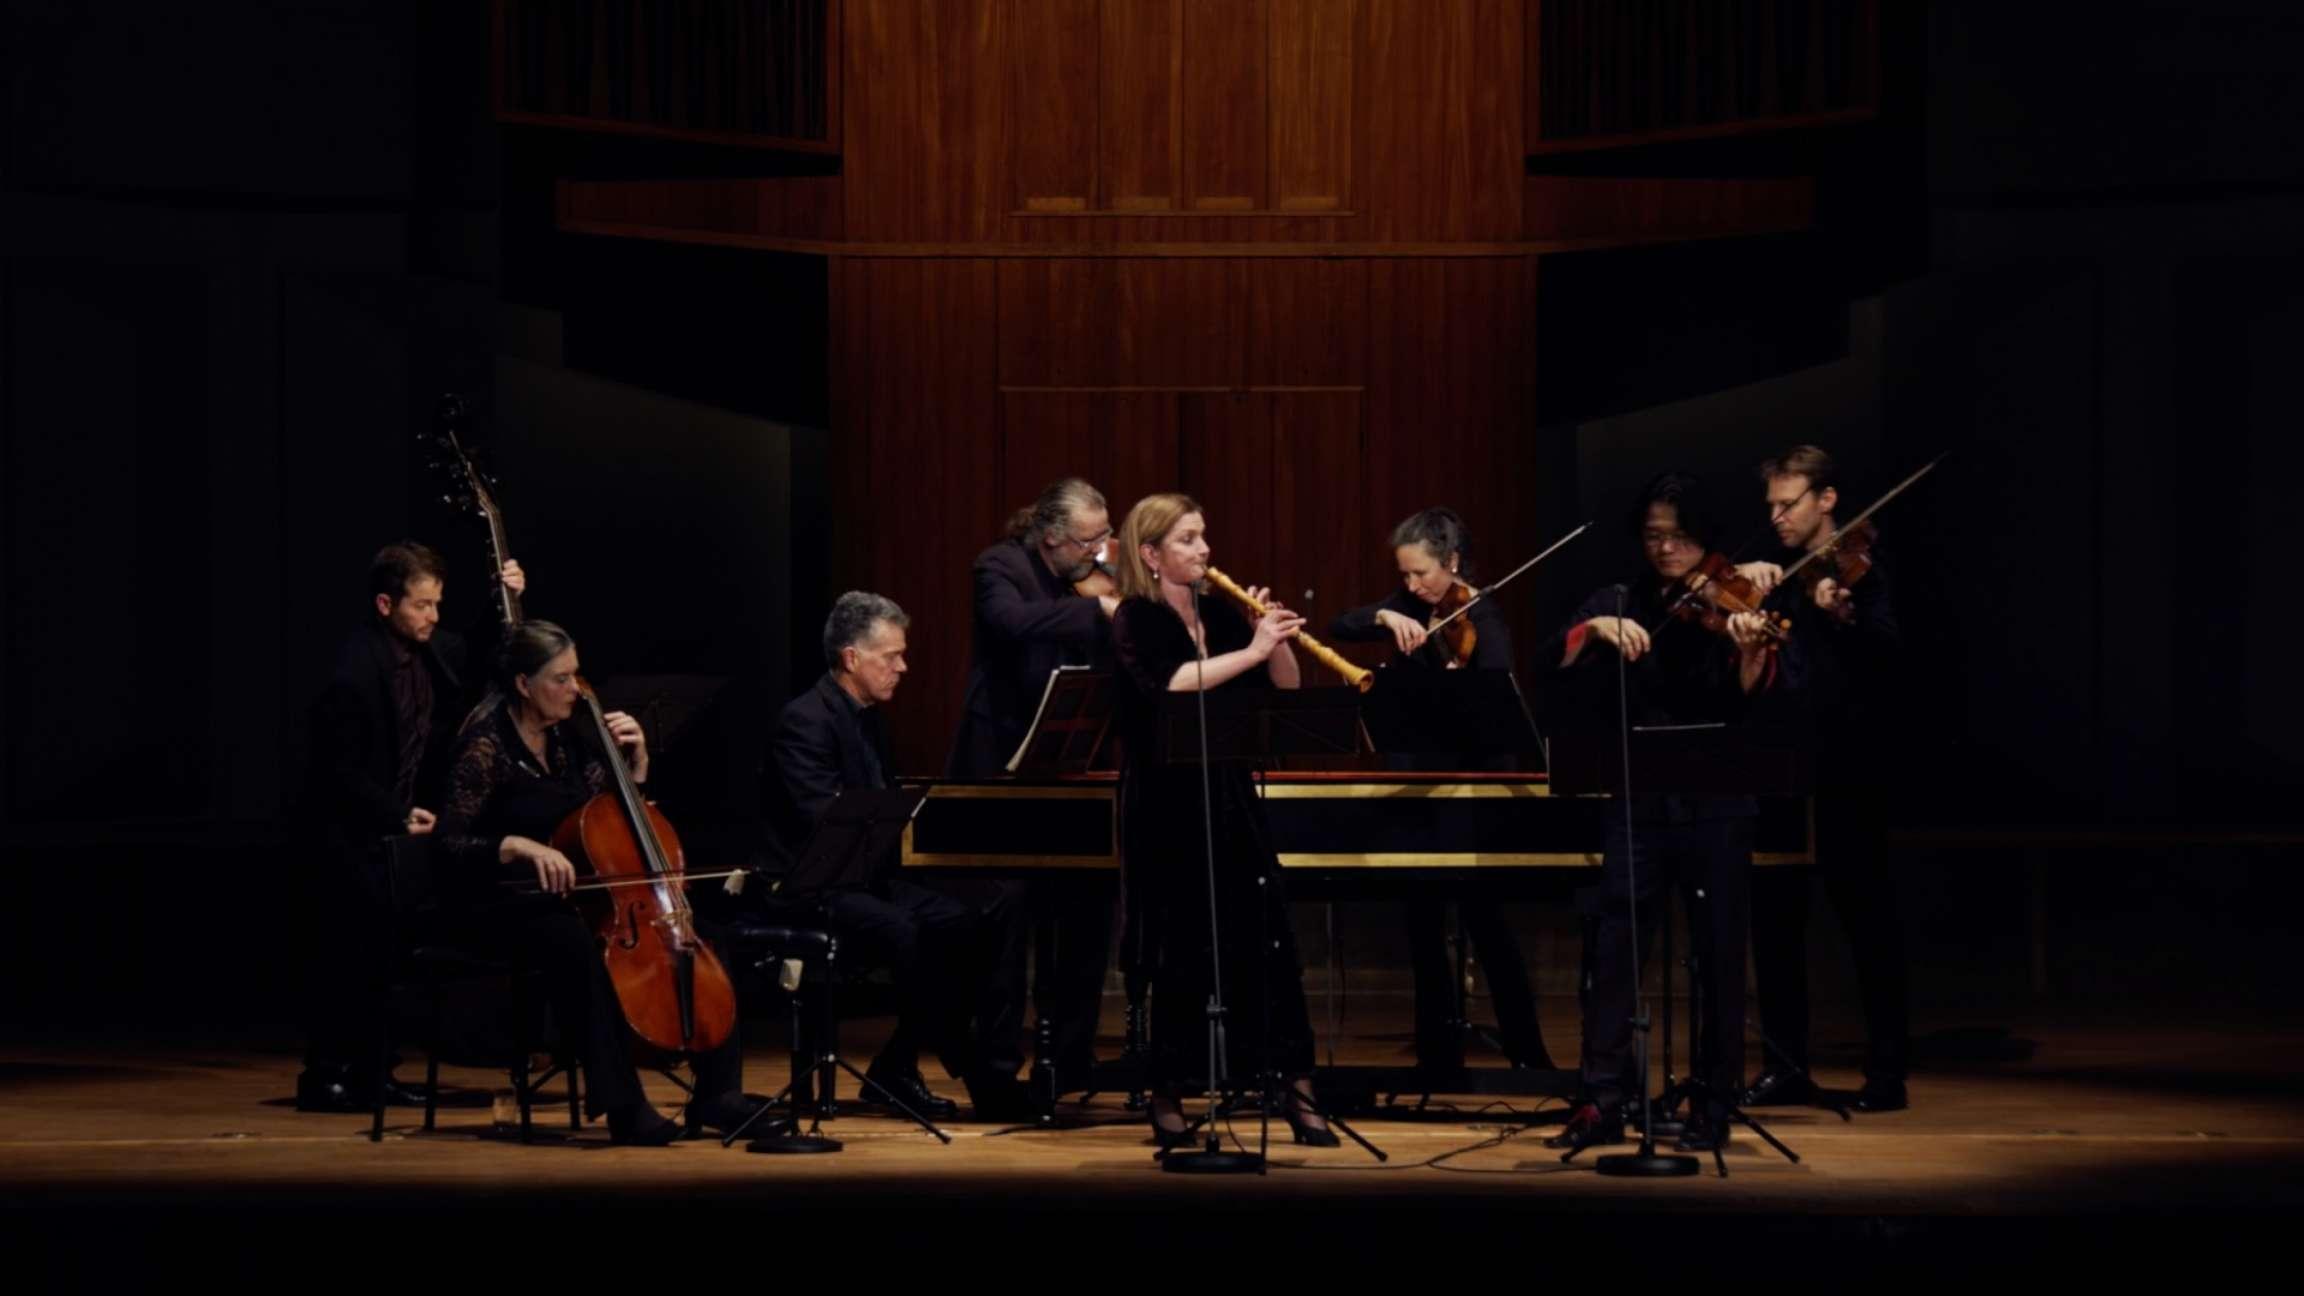 Concerto for oboe and violin in C minor